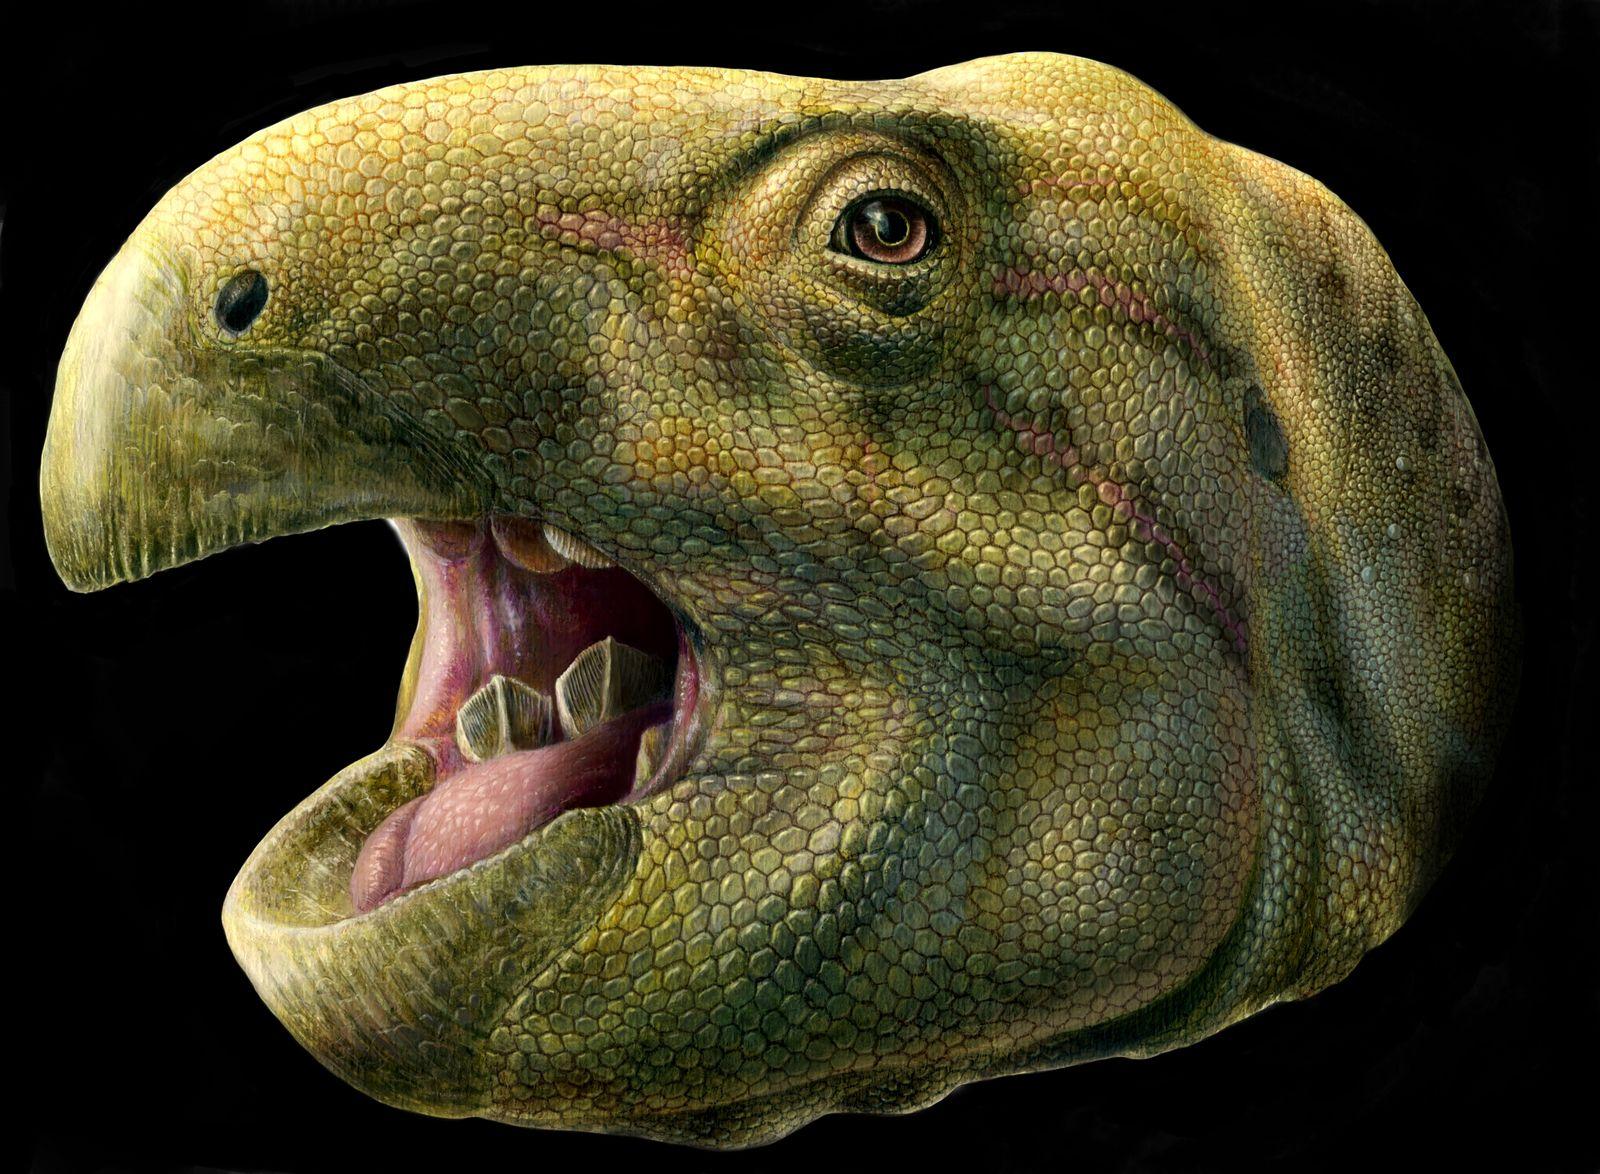 EINMALIGE VERWENDUNG EINMALIGE VERWENDUNG SPERRFRIST 26.10.2017, 15UHR Dinosaurier/ MatheronodonDinosaurier/ Matheronodon